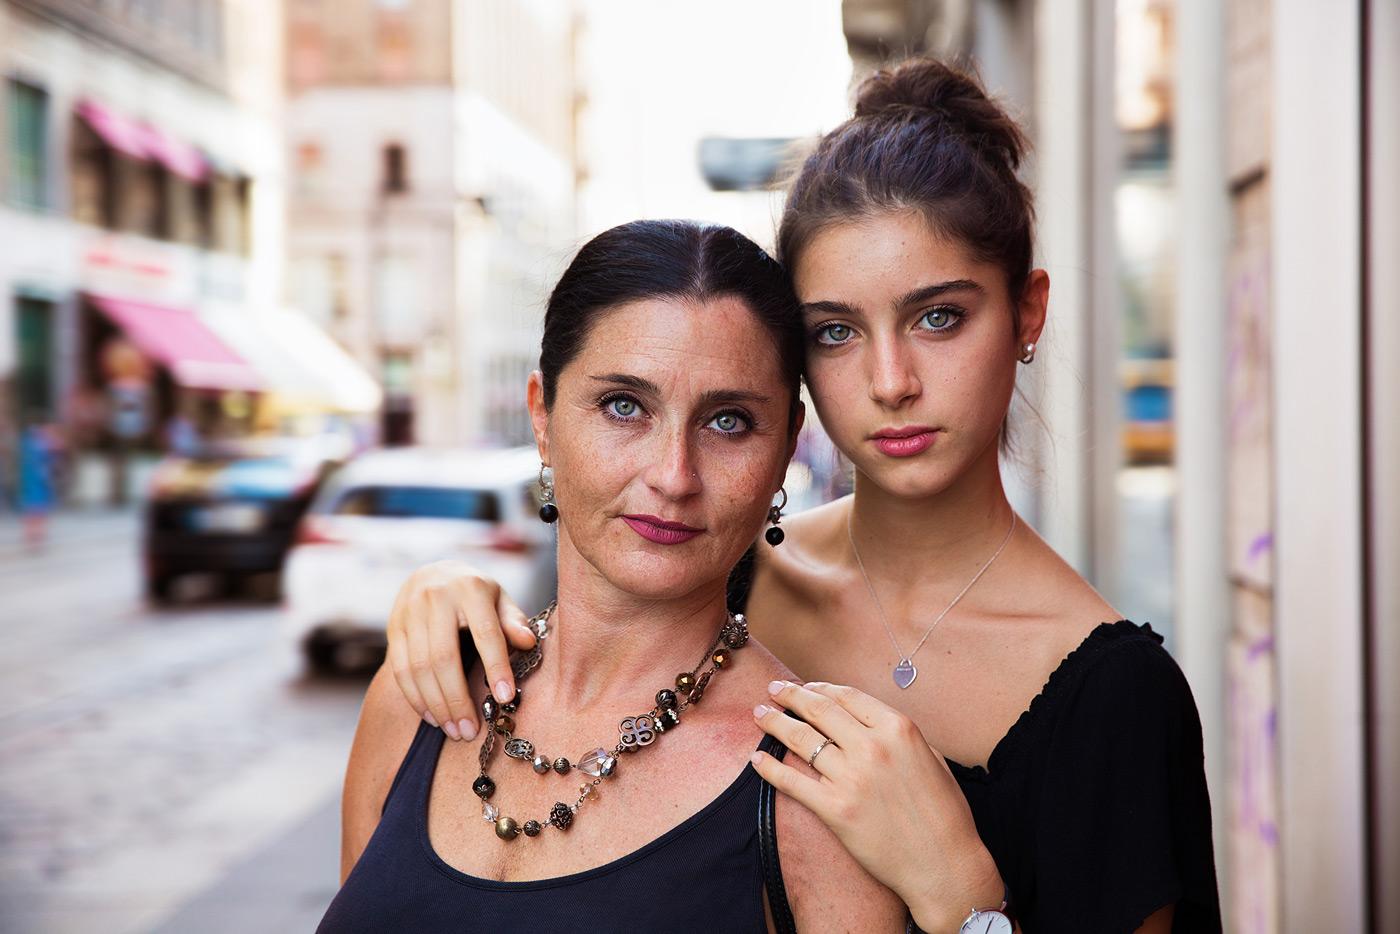 Atlas of Beauty: Mutter und Tochter in Milan // HIMBEER